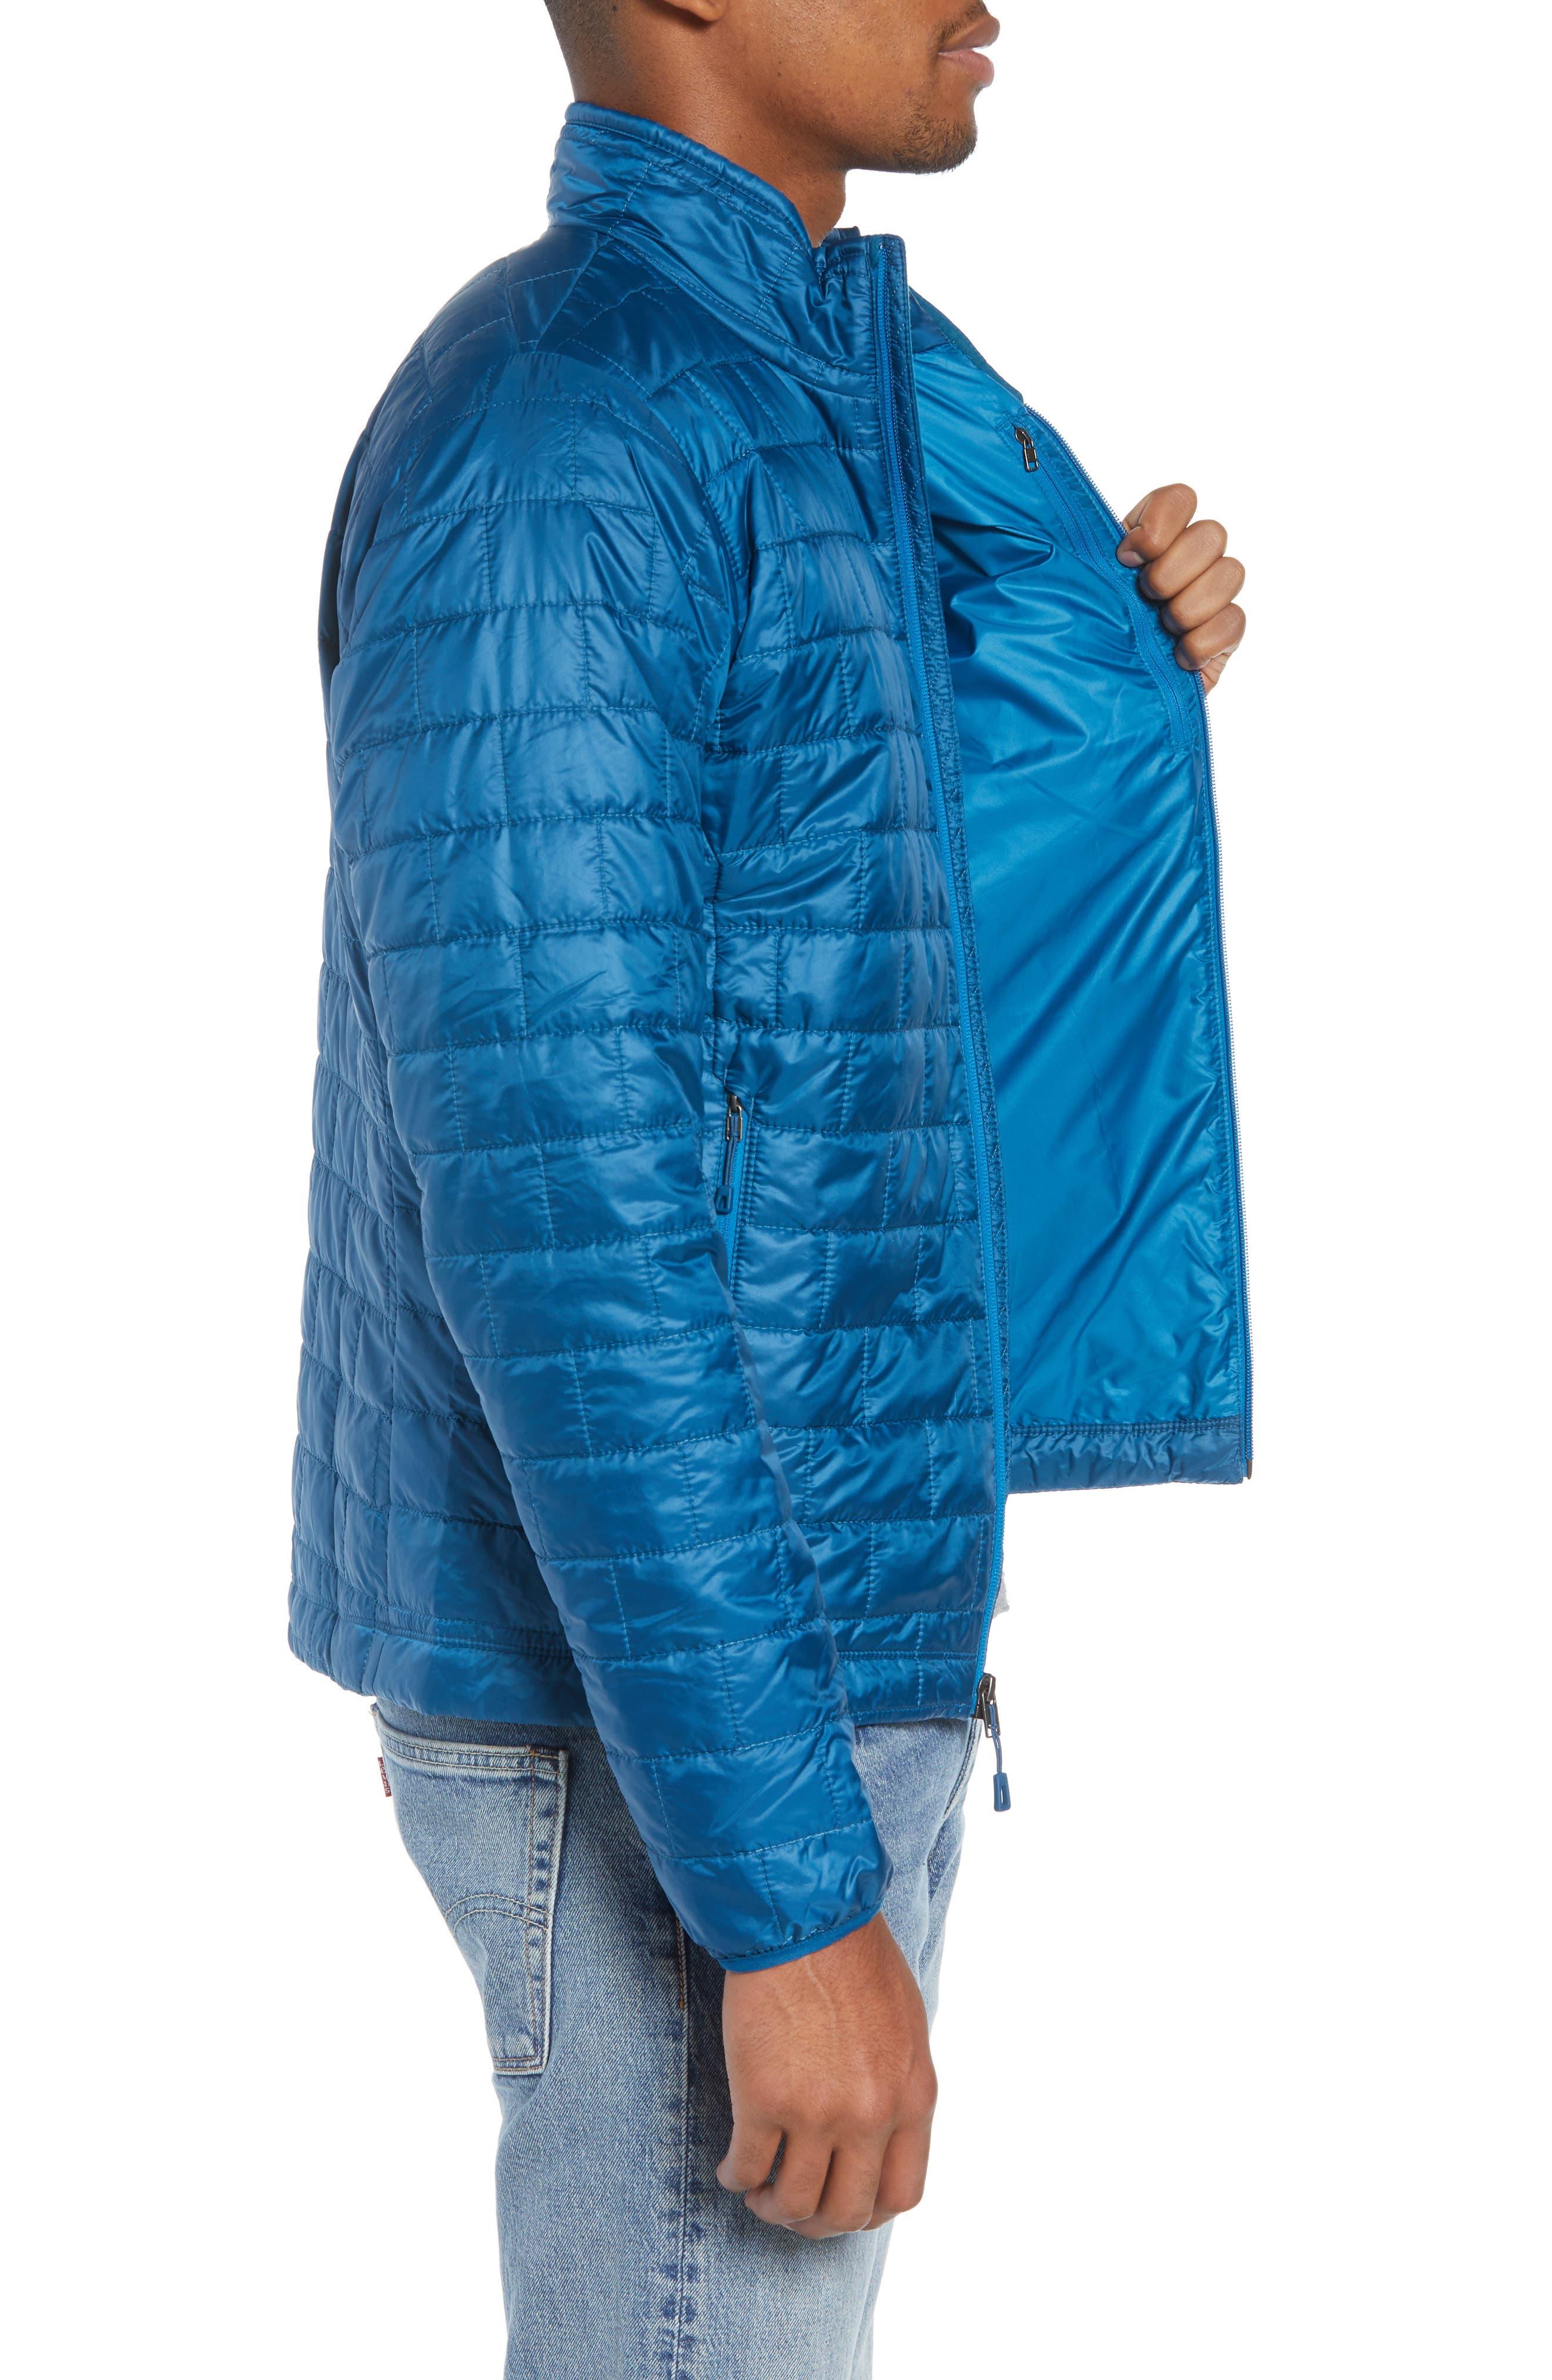 PATAGONIA, 'Nano Puff<sup>®</sup>' Water Resistant Jacket, Alternate thumbnail 4, color, BIG SUR BLUE W/ BALKAN BLUE